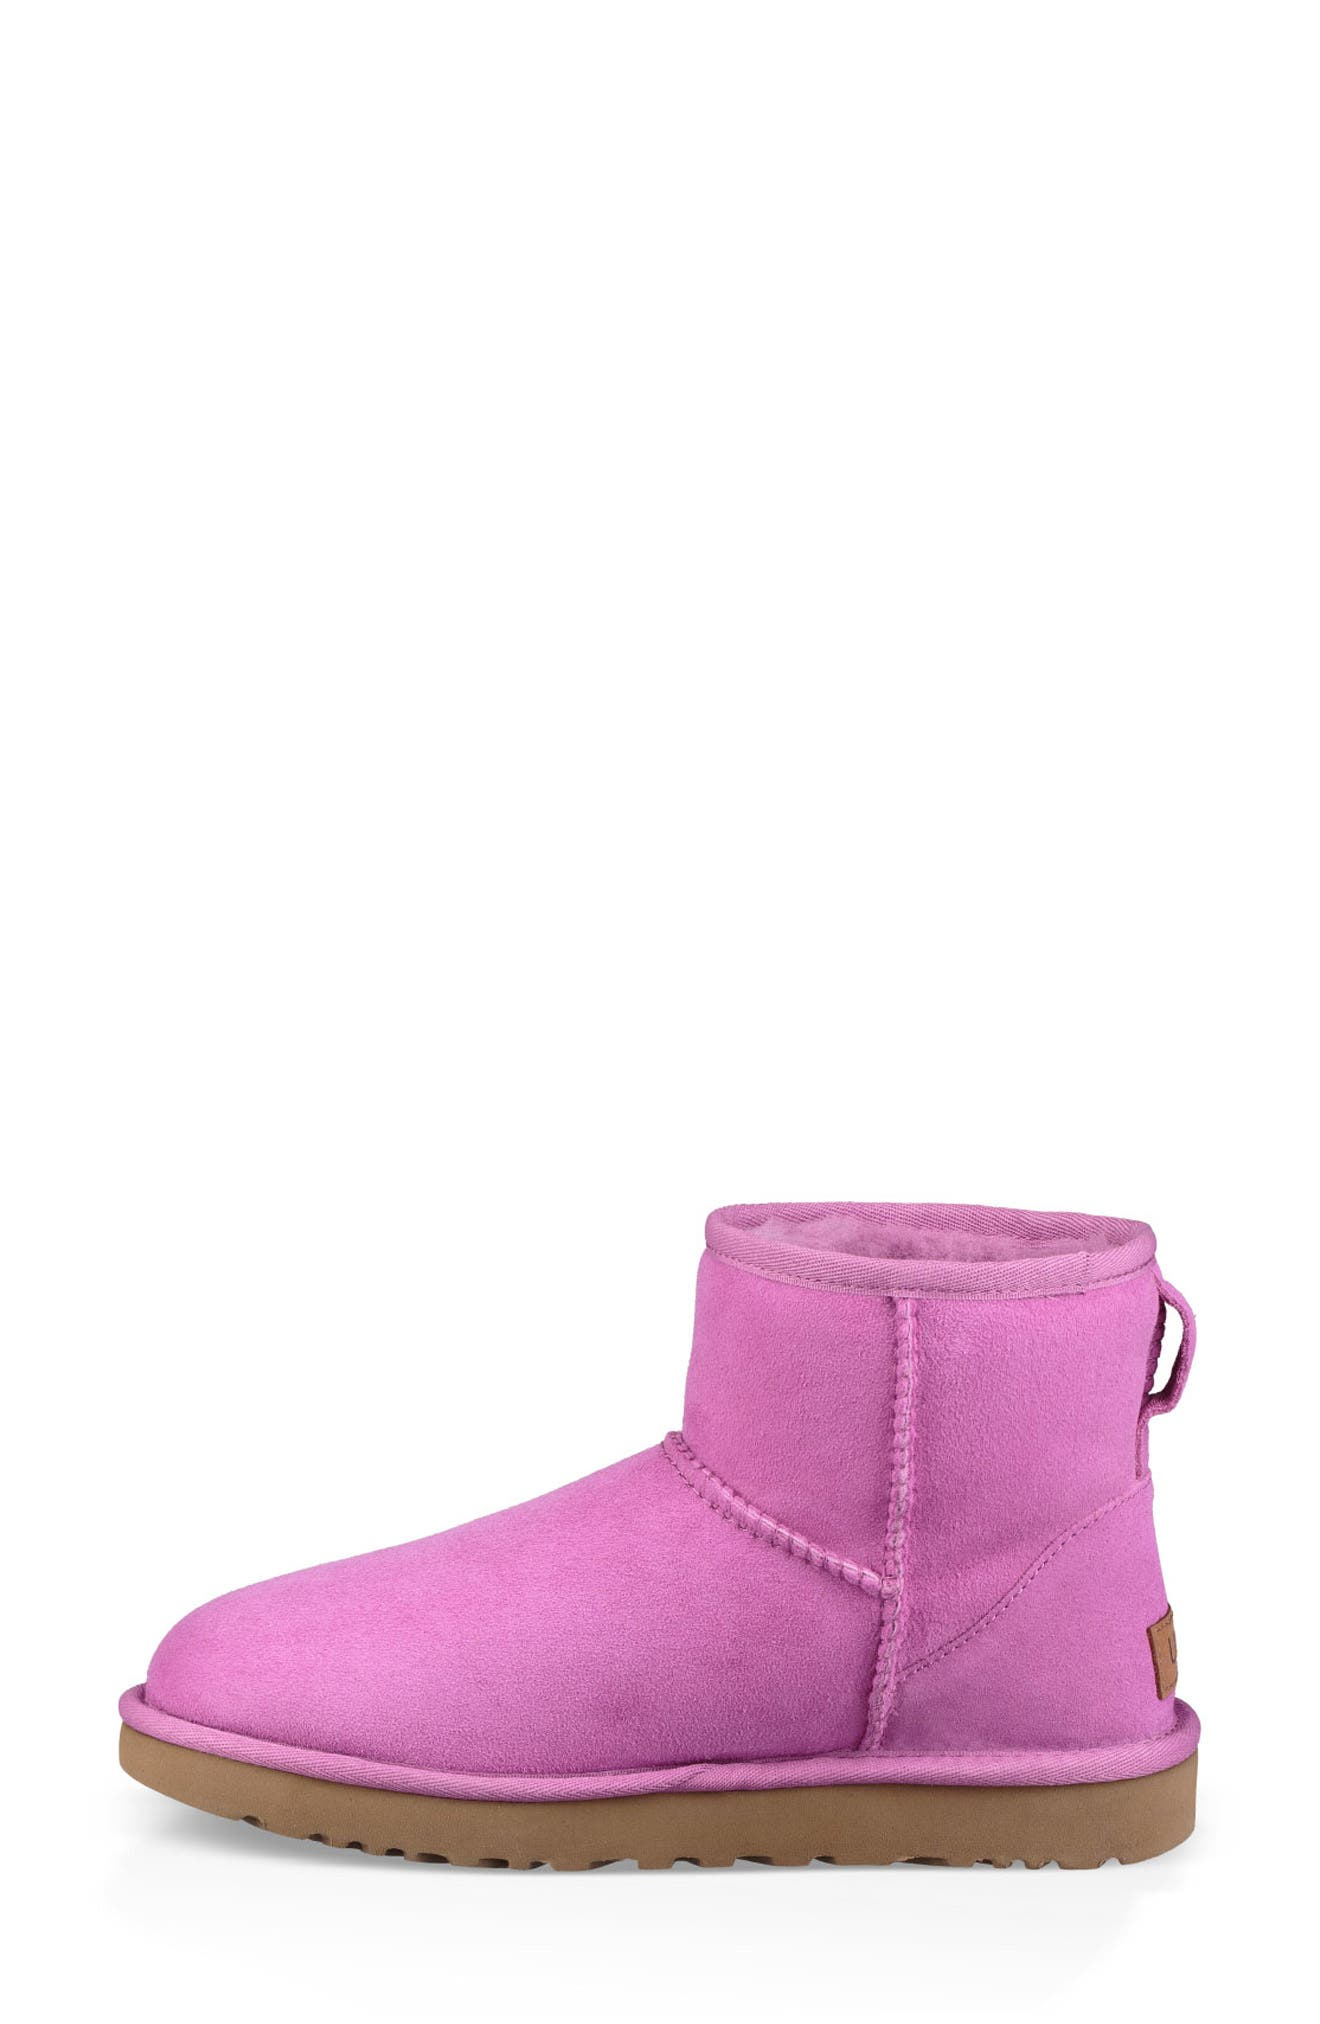 ,                             Classic Mini II Genuine Shearling Lined Boot,                             Alternate thumbnail 52, color,                             528